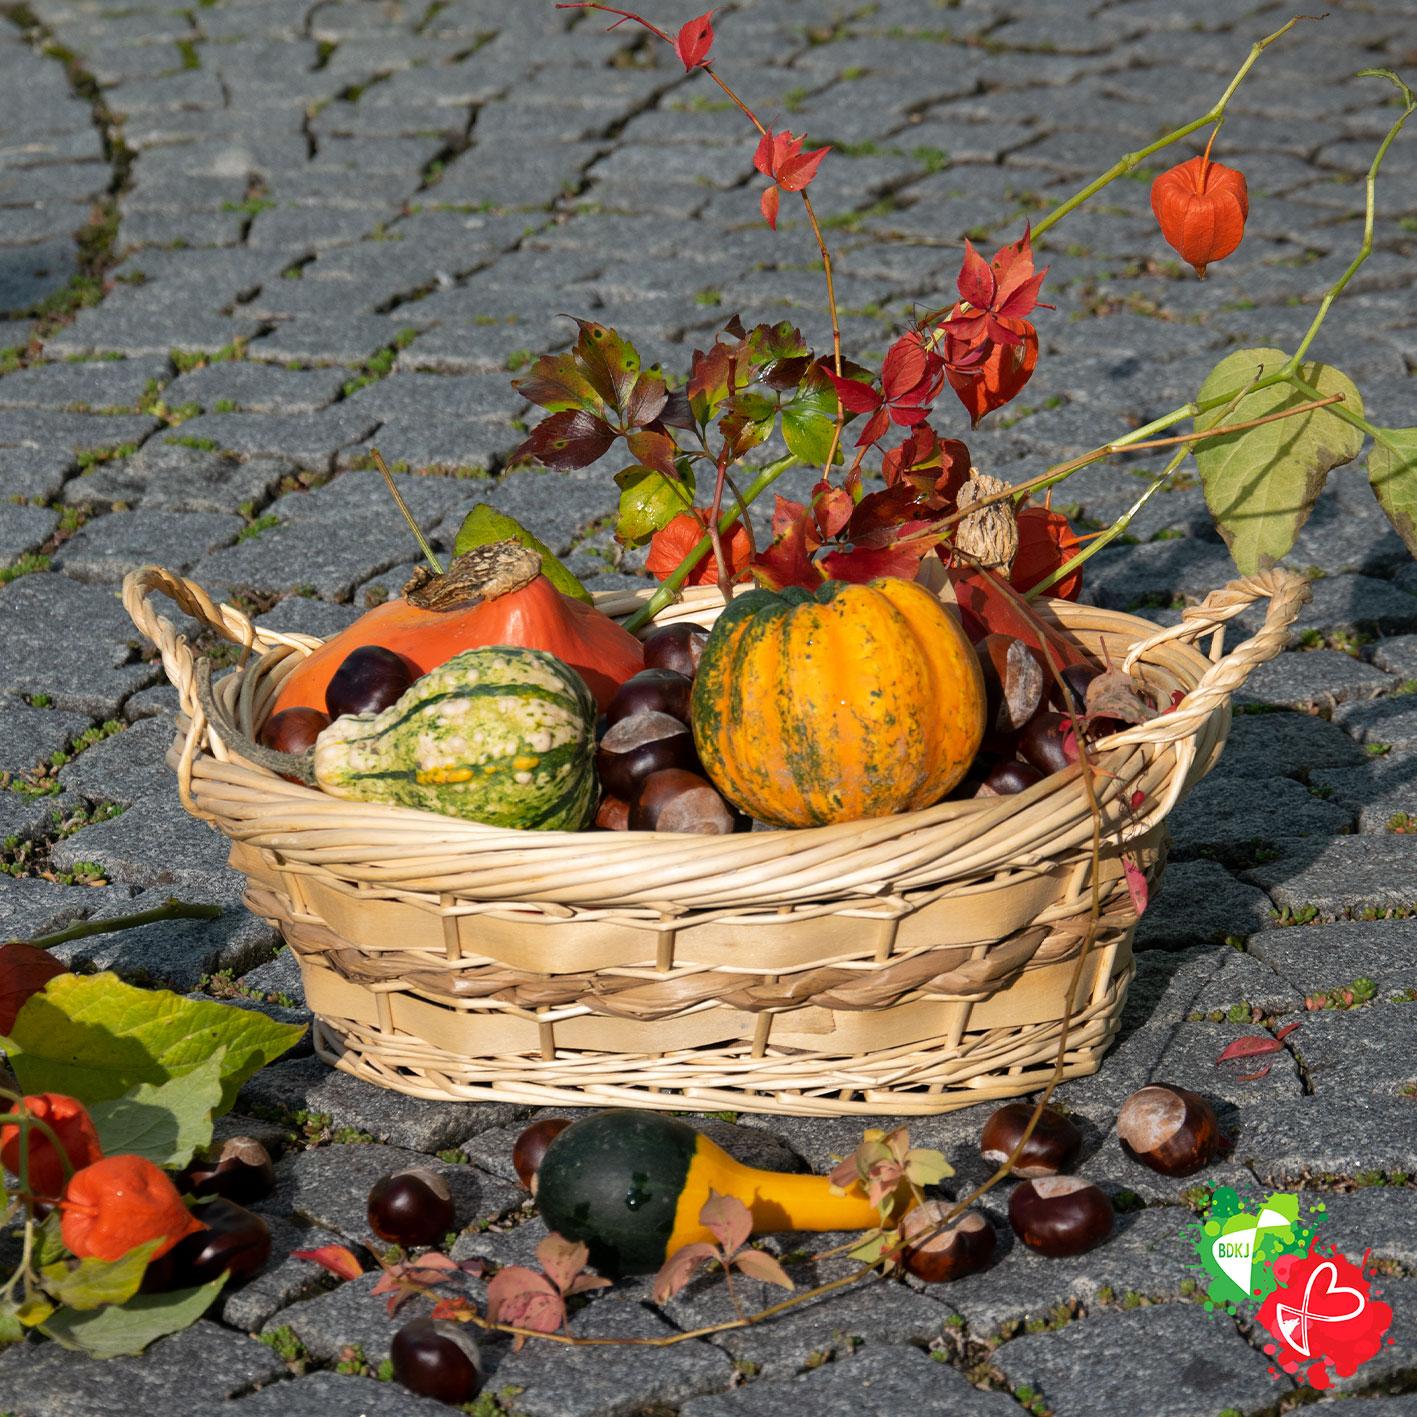 Ein Korb voller Herbstideen